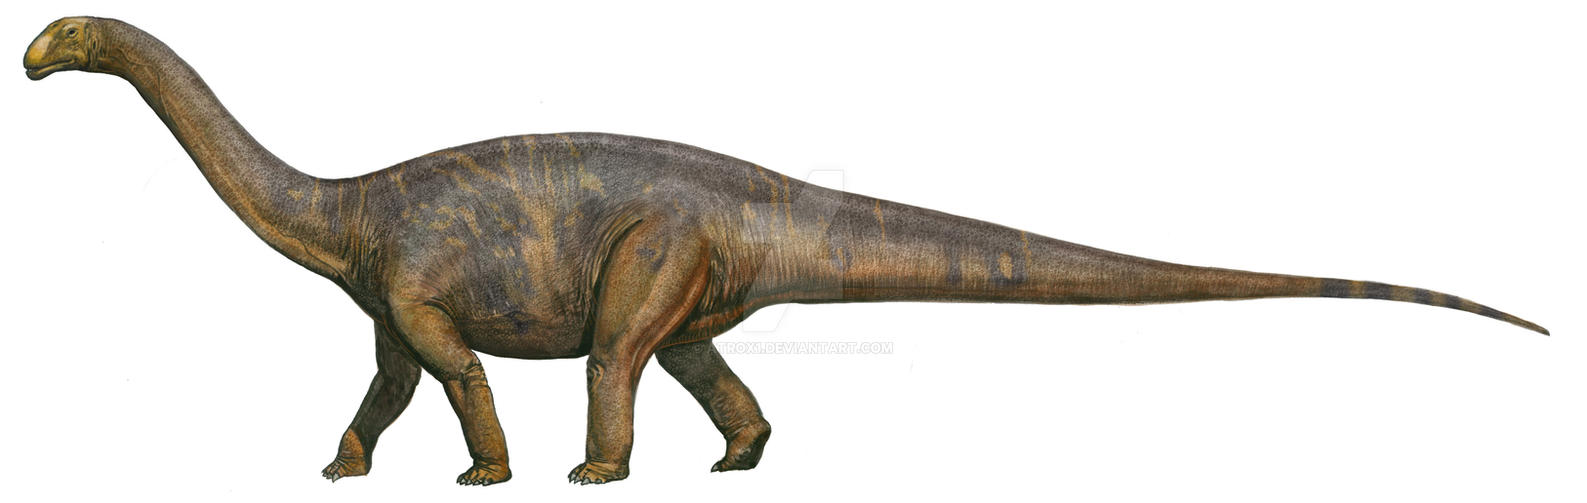 cetiosaurus by atrox1